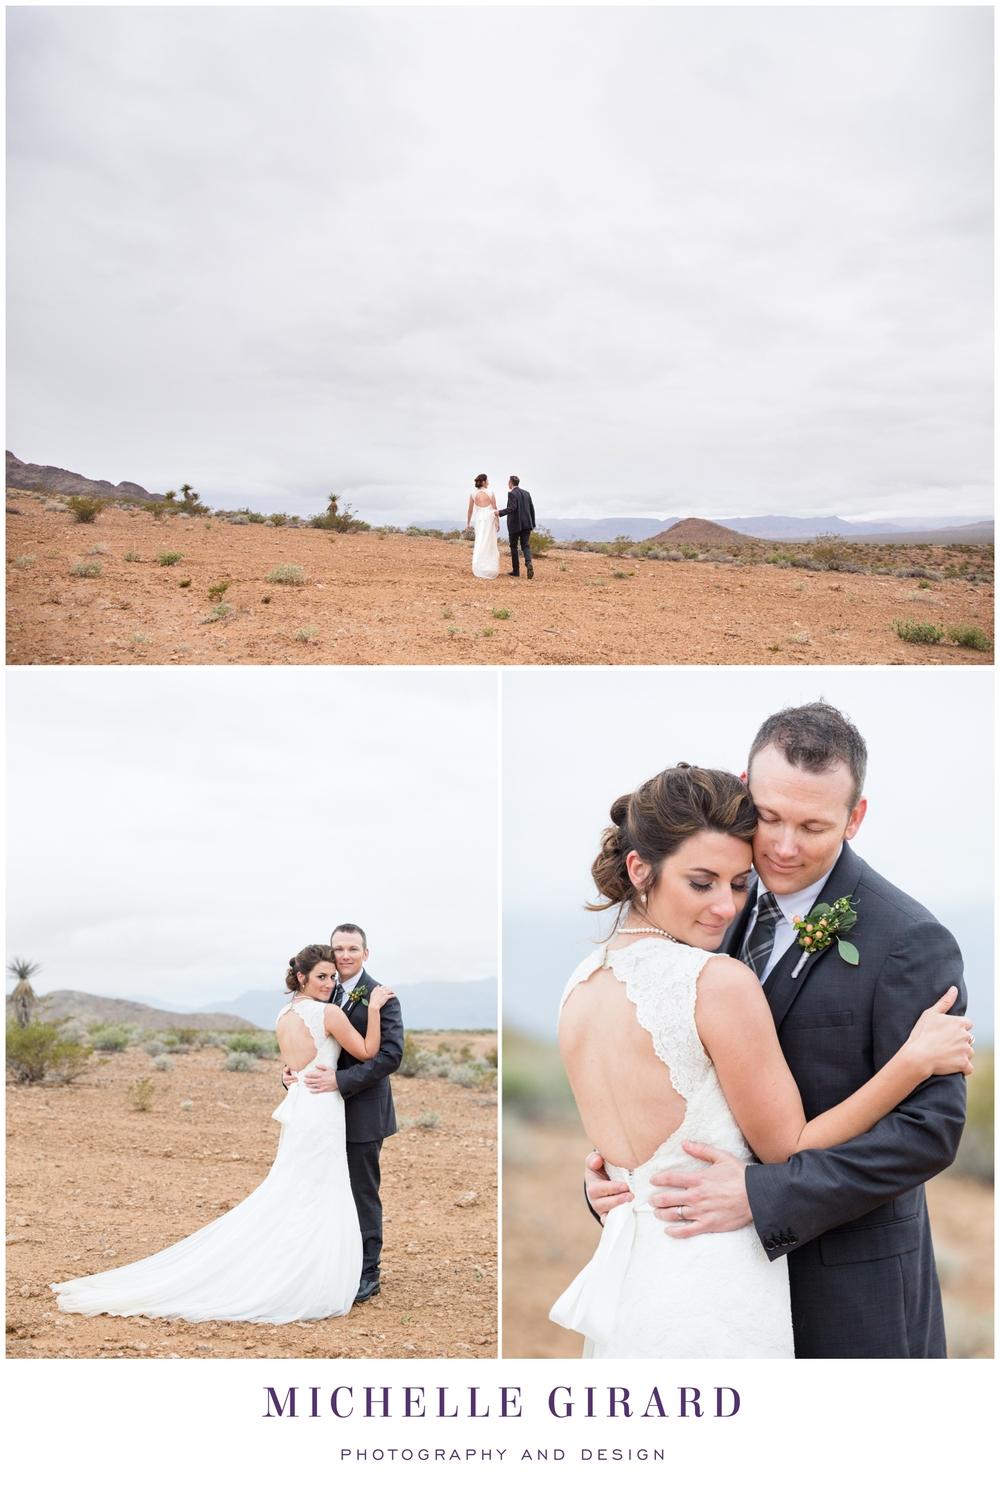 las-vegas-desert-wedding-bride-groom-photography-nevada-michelle-girard-22.jpg